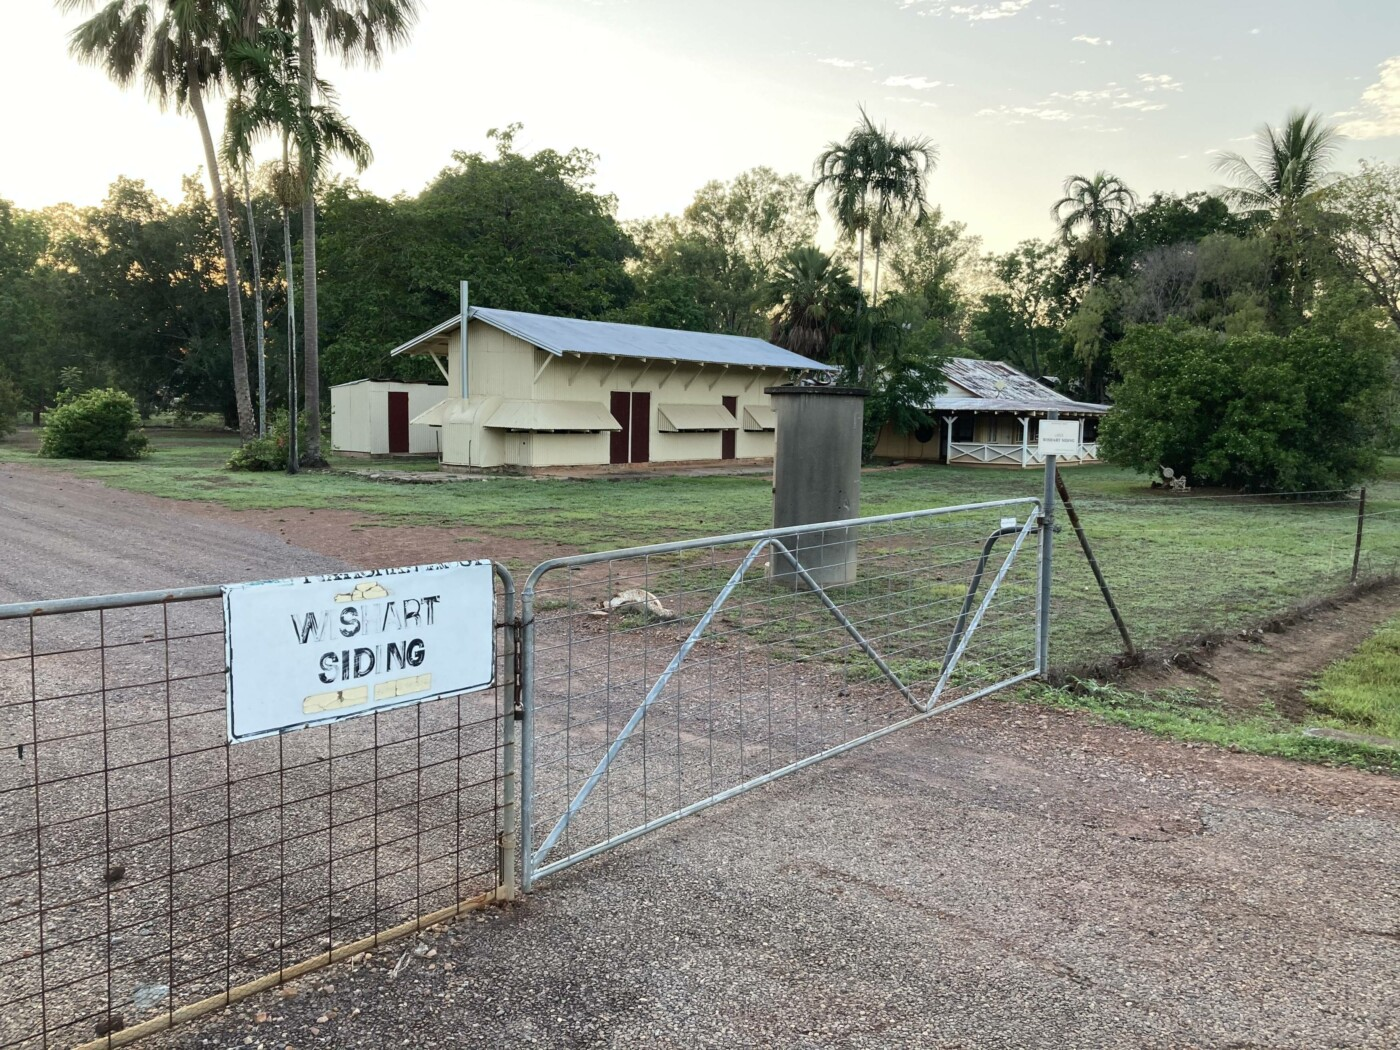 Wishart siding Fettler's huts (2020-10)